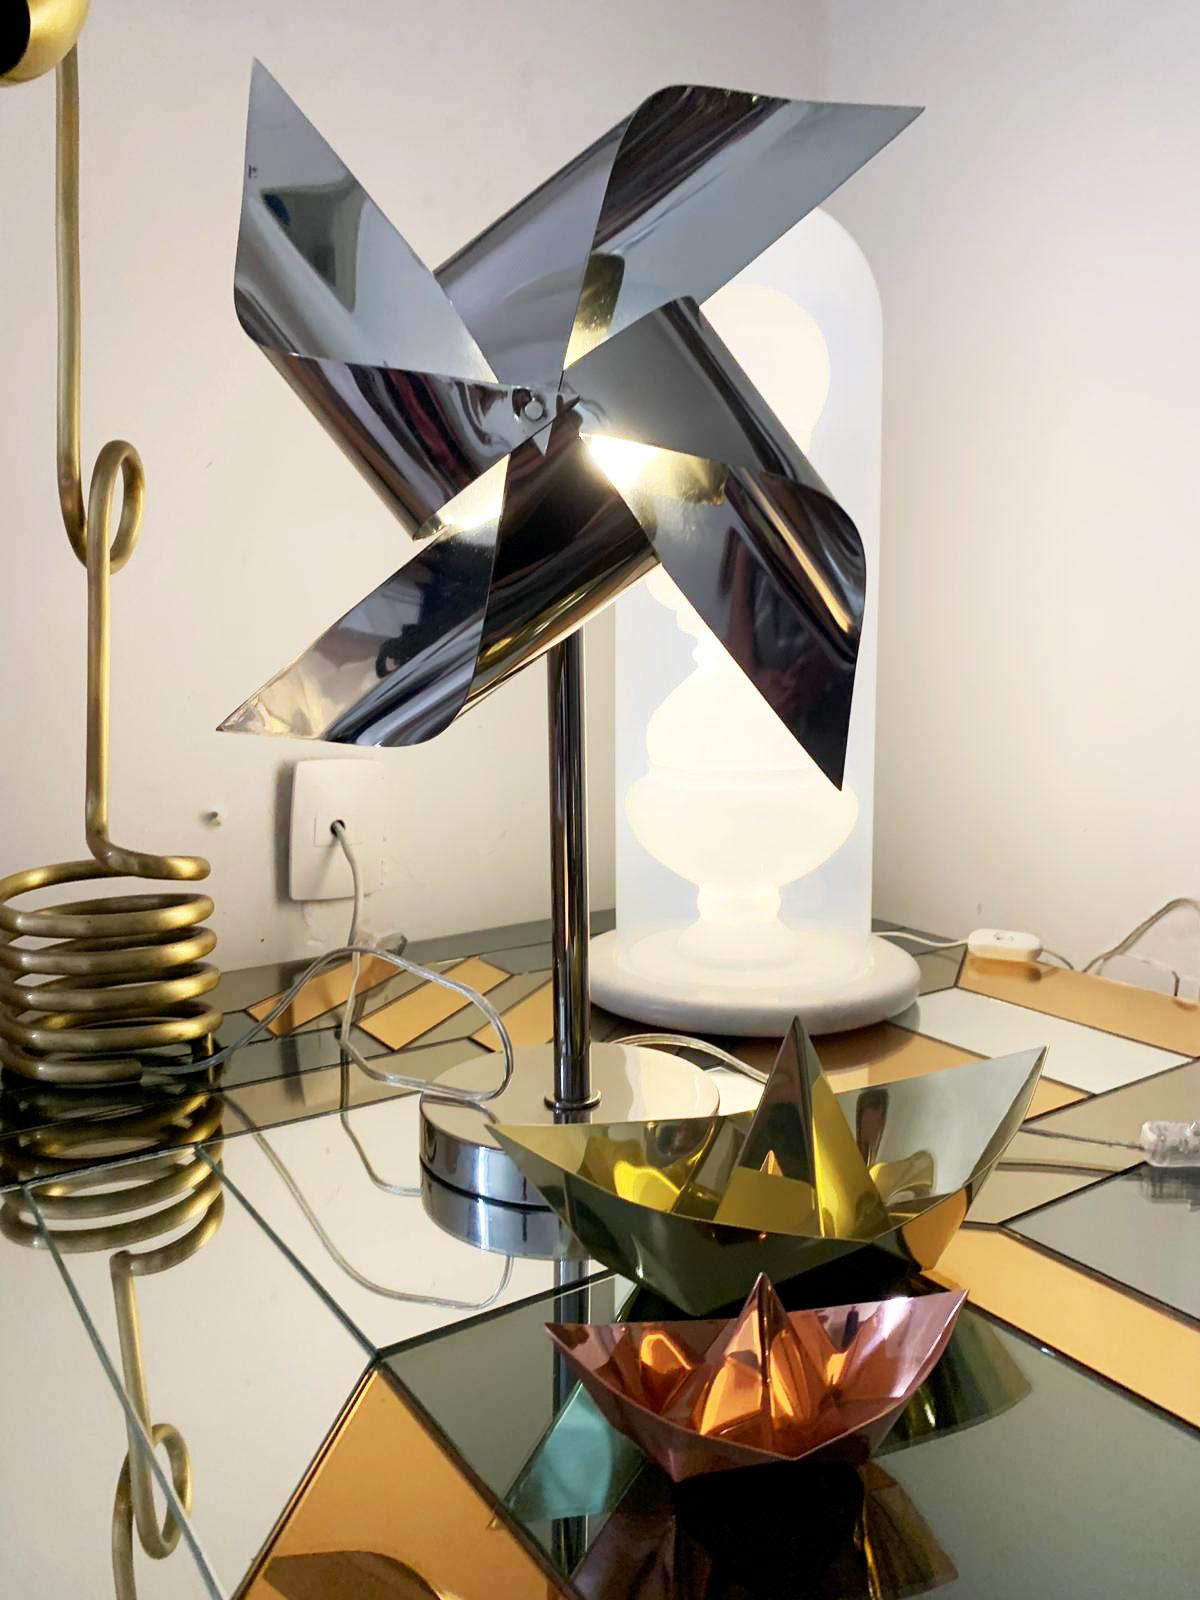 Visit of the studio of Bianca Barbato / Sao Paulo